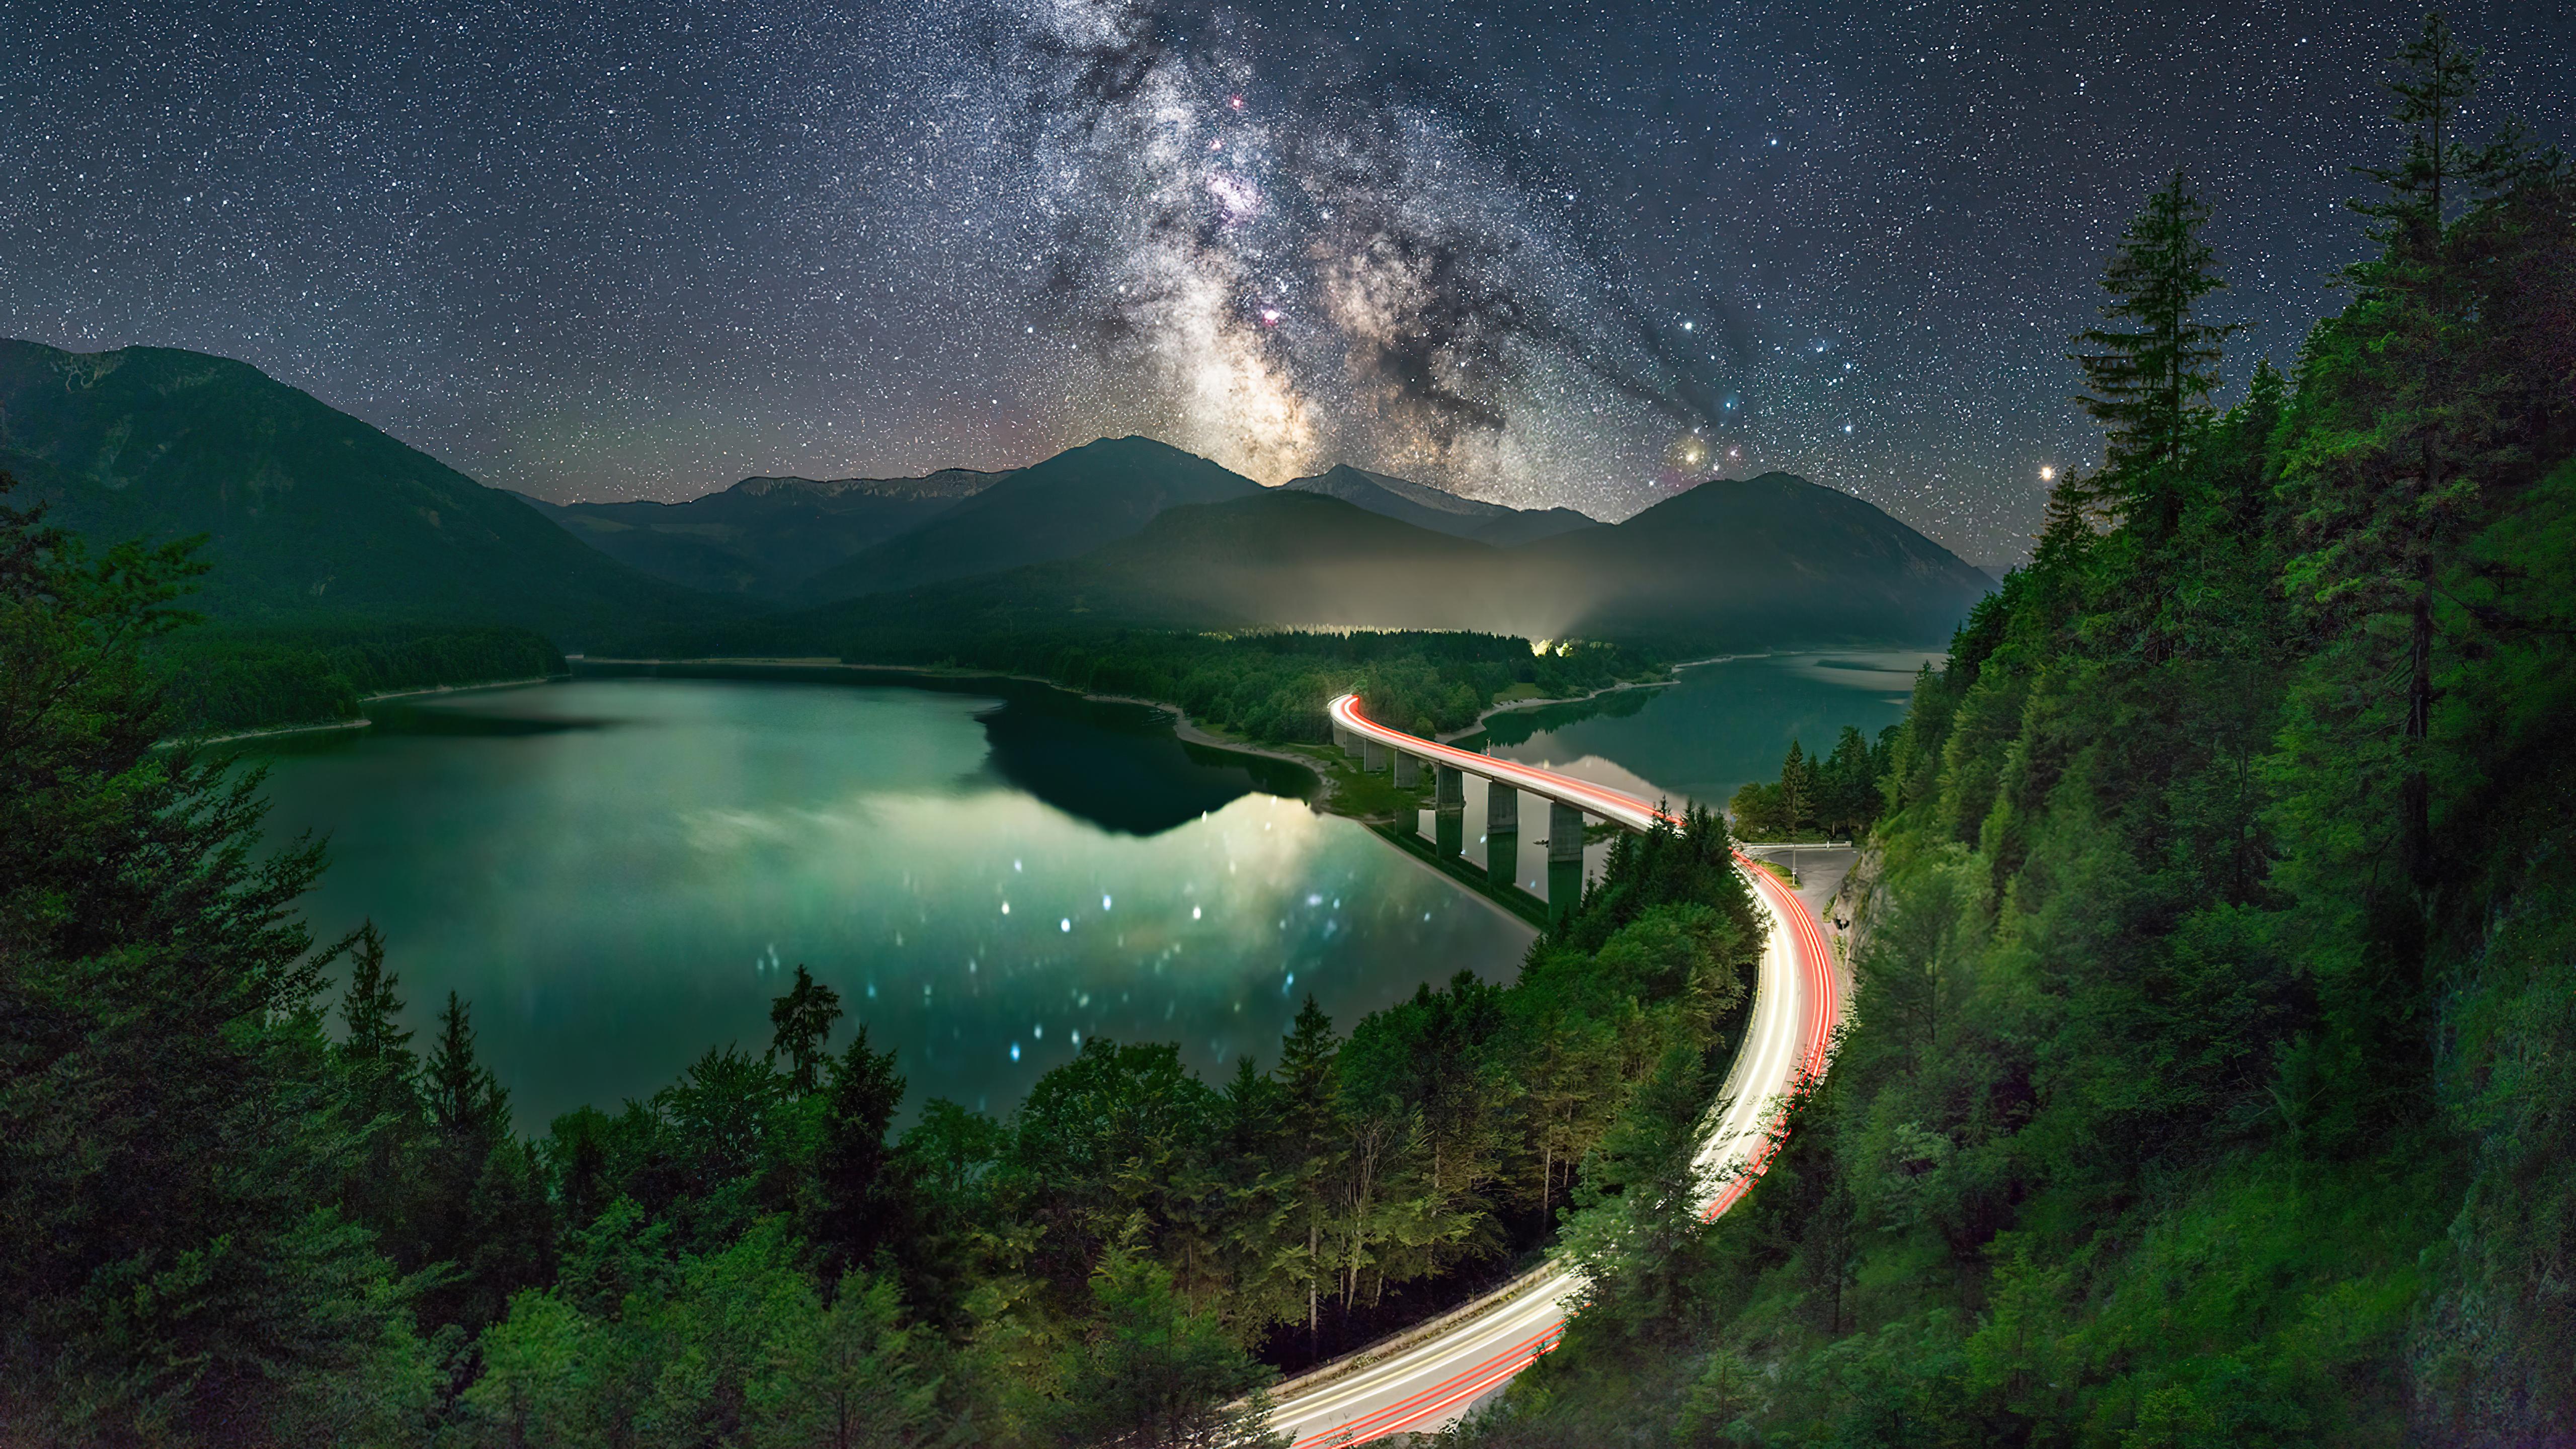 milky way road long exposure 4k 1615197385 - Milky Way Road Long Exposure 4k - Milky Way Road Long Exposure 4k wallpapers